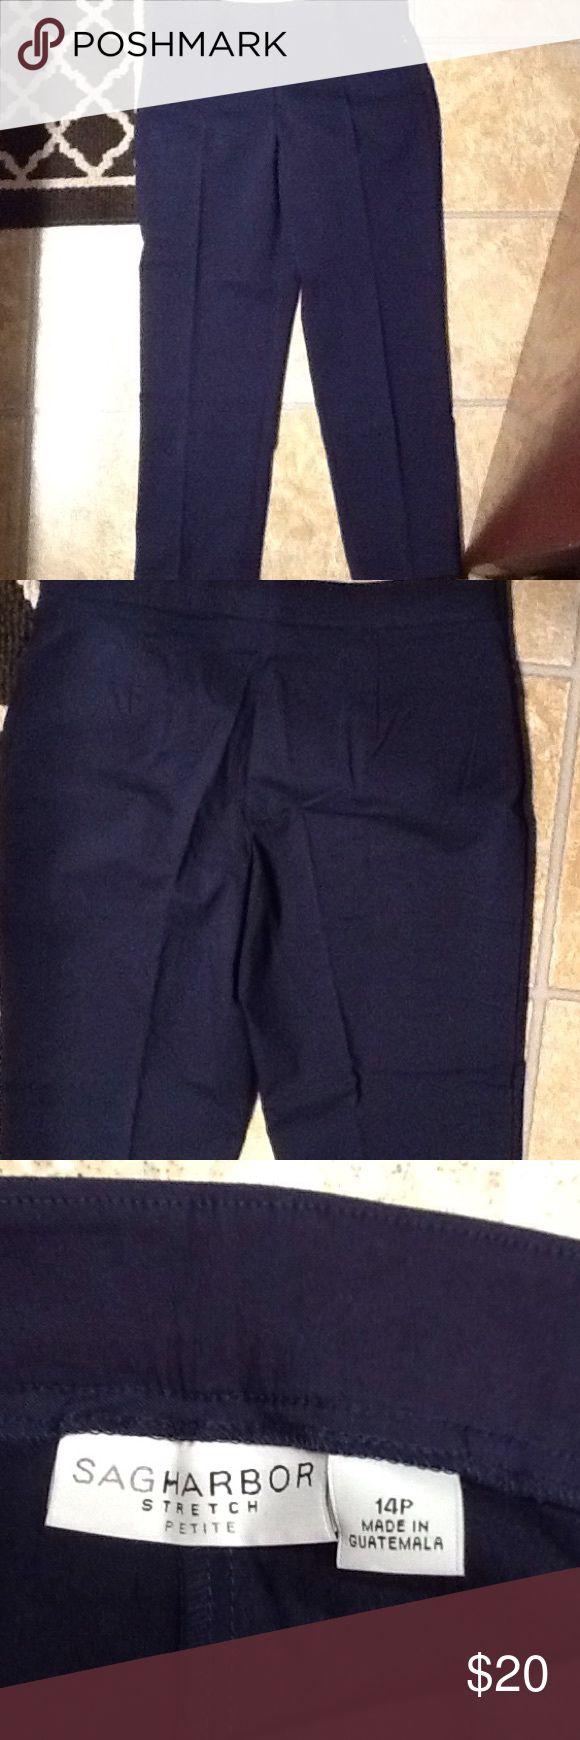 Sag Harbor Petite Pants Sag Harbor Stretch Petite Pants Size 14P Navy Blue Sag Harbor Pants